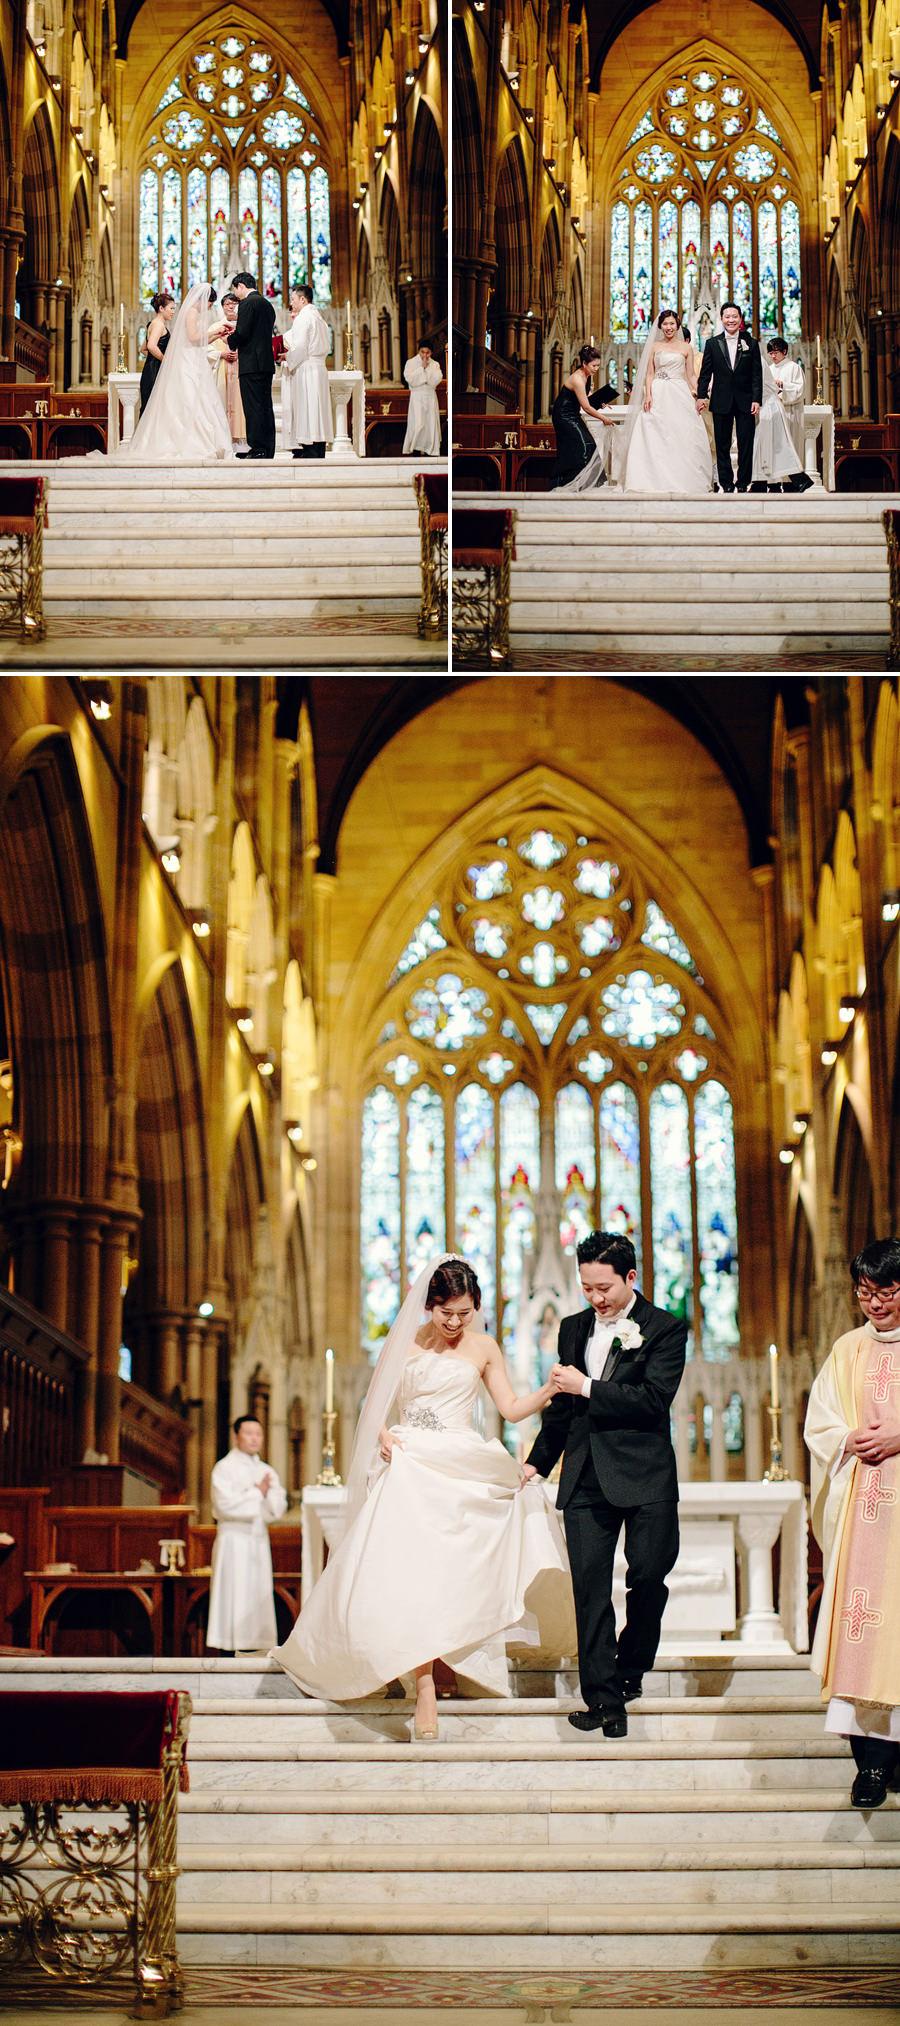 Sydney Wedding Photojournalism: Catholic Ceremony